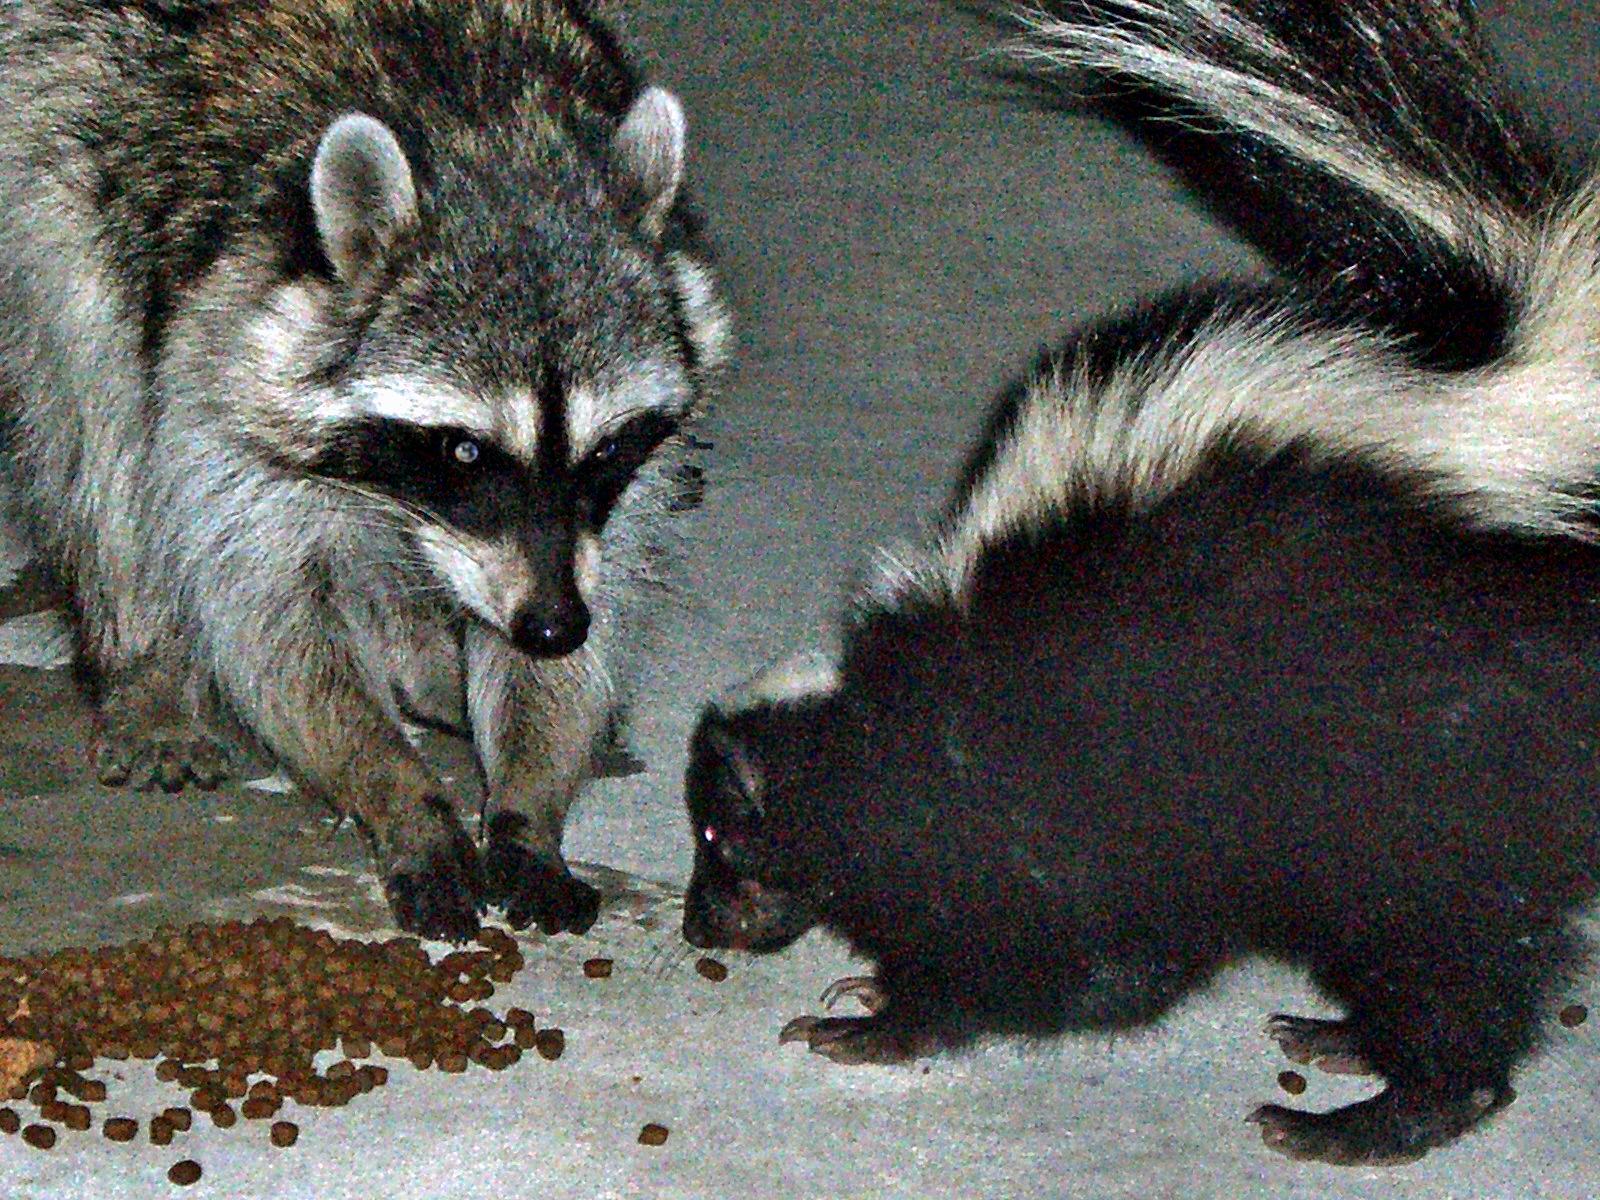 Urban_raccoon_and_skunk.JPG